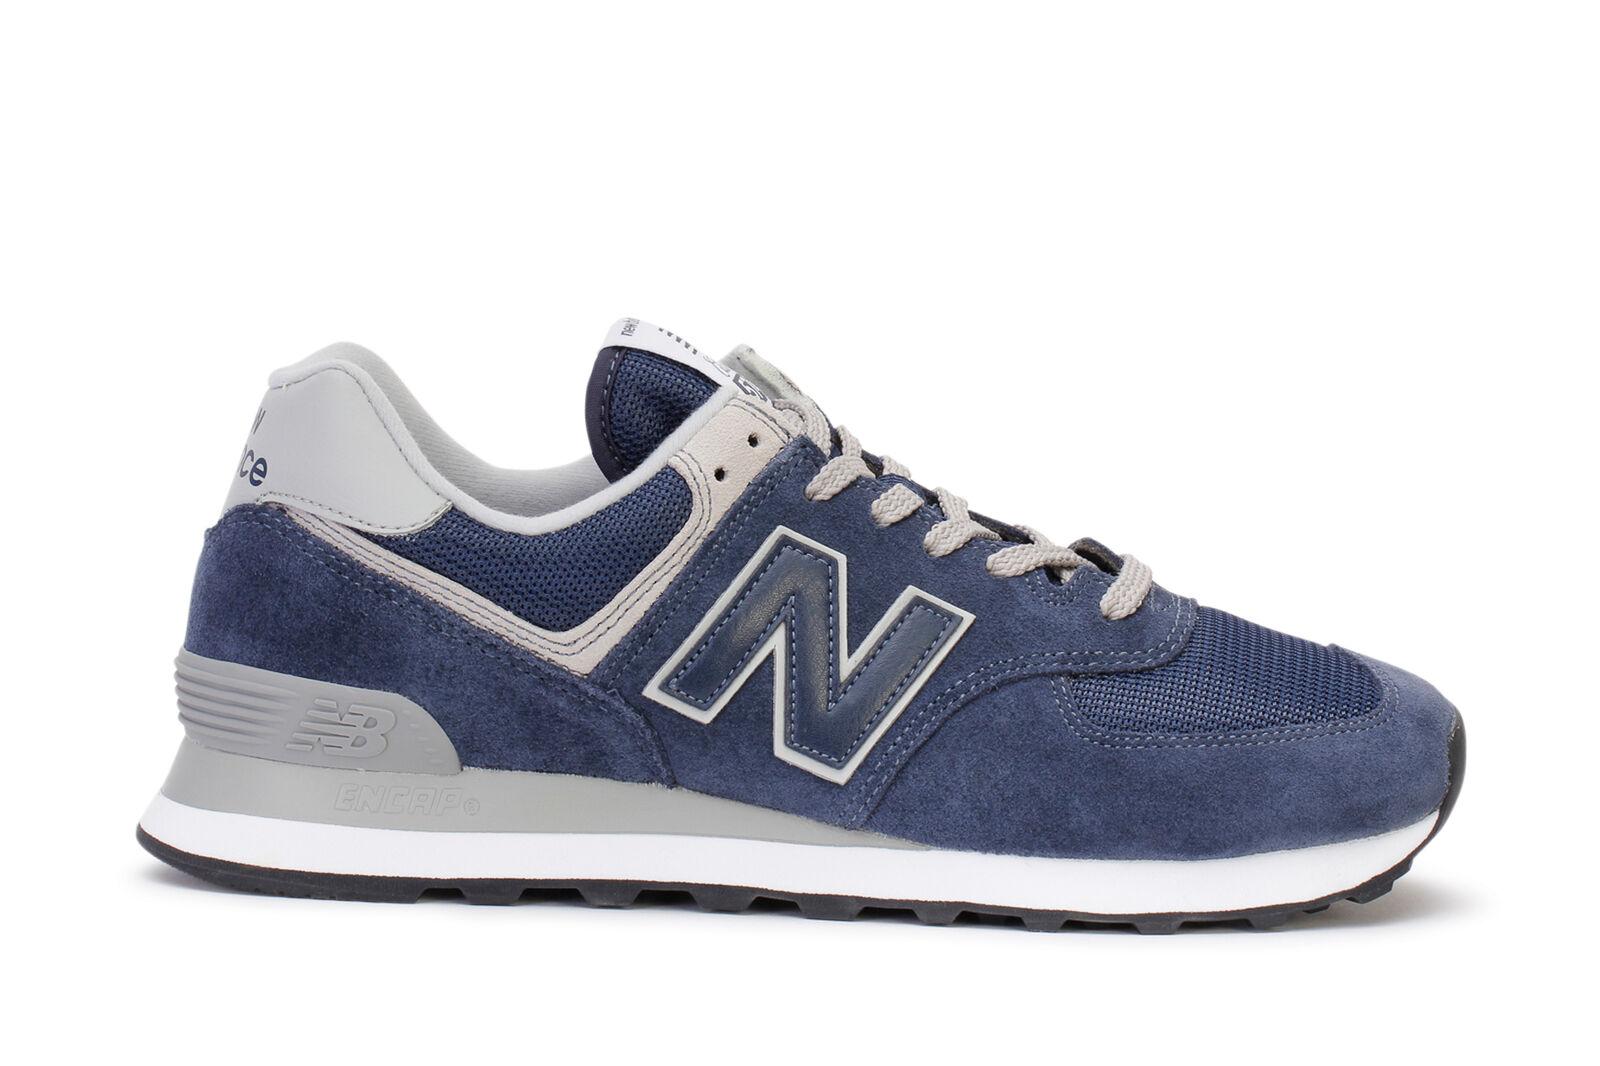 New Balance hombres' Classic s corriendo zapatillas 574 Classic hombres' Navy ml574egn a53f96